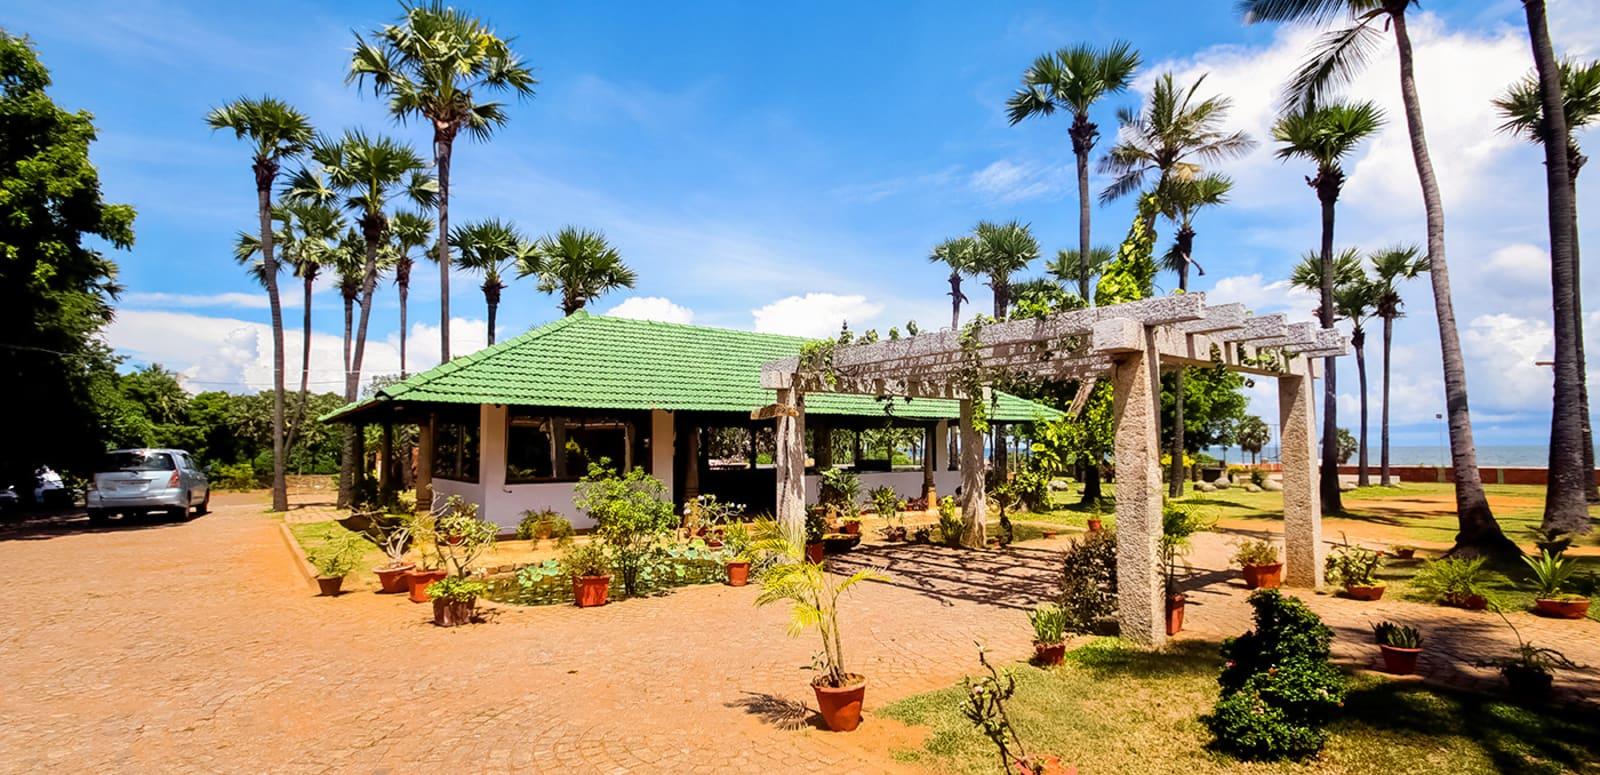 Beach Resort Stay In Pondicherry Flat